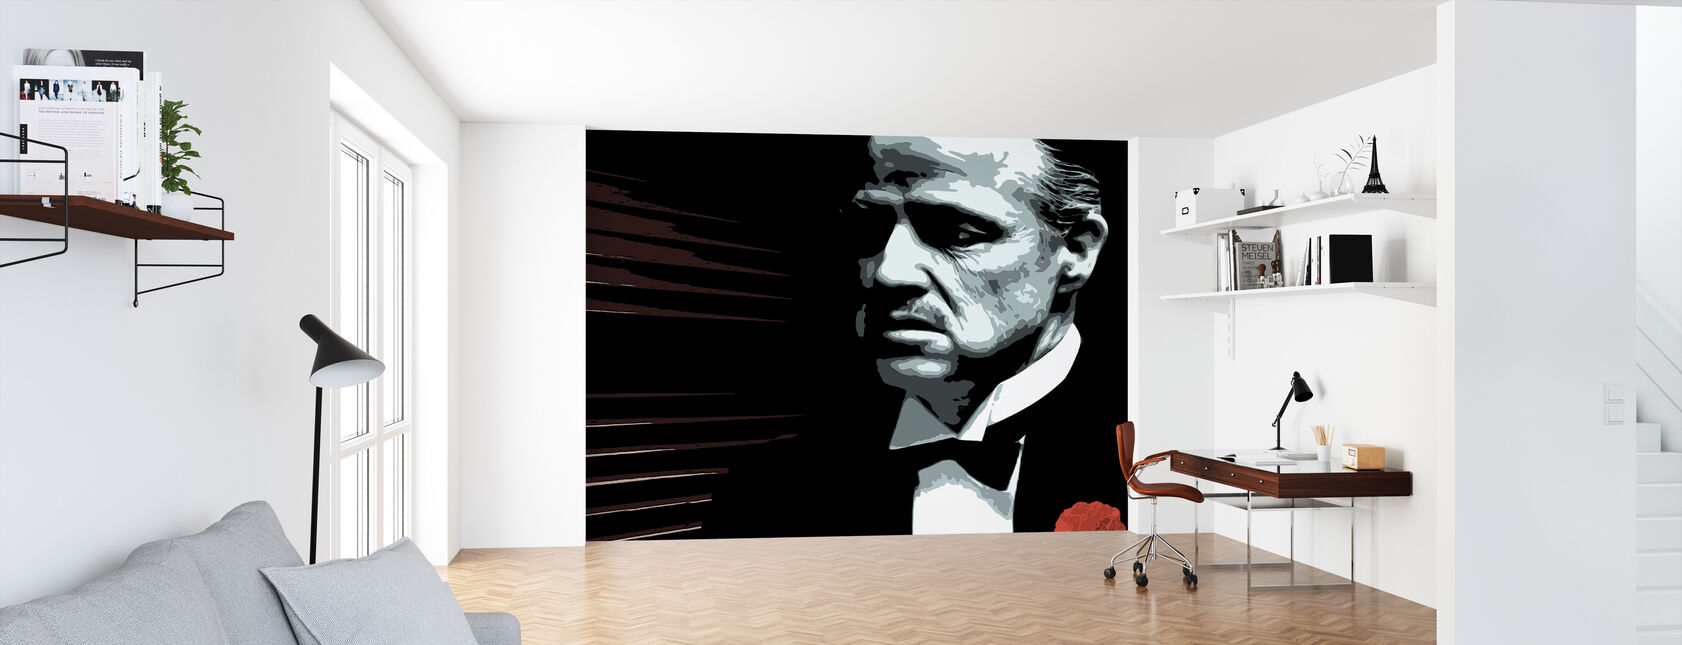 Don Vito - Wallpaper - Office